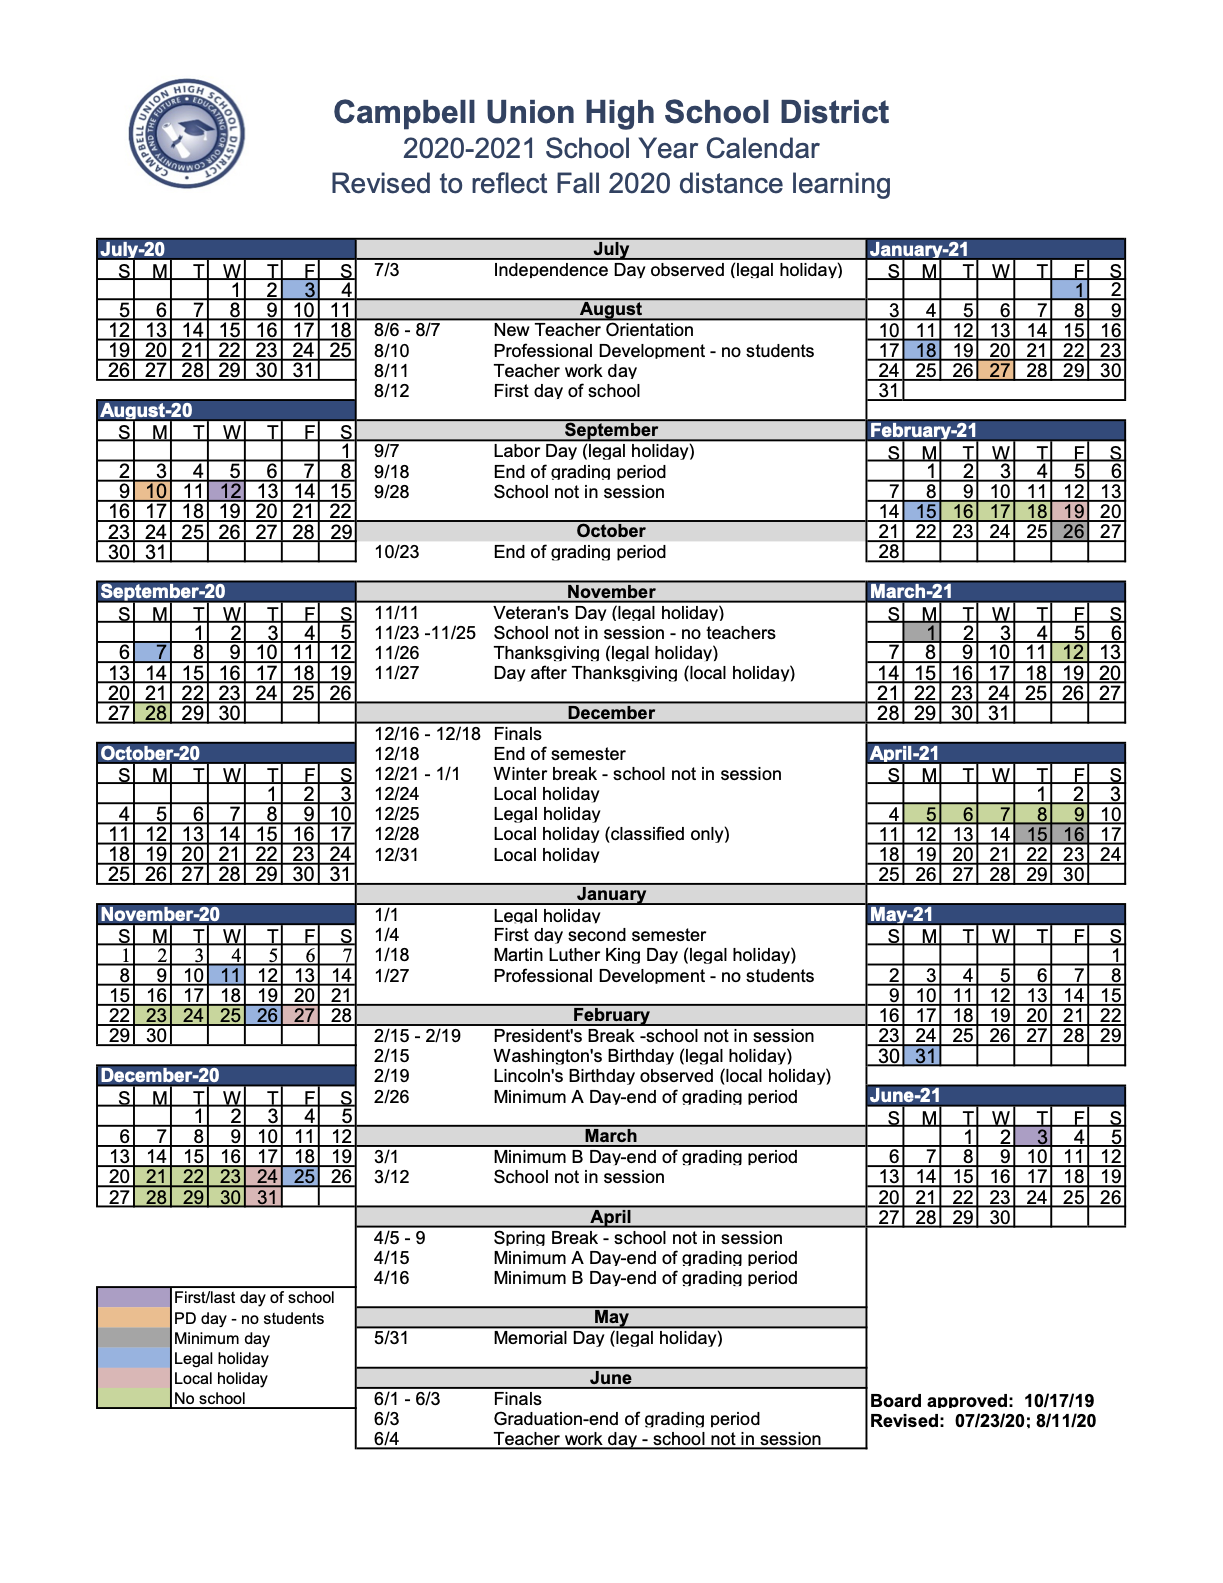 Revised Academic Calendar SY 2020-2021